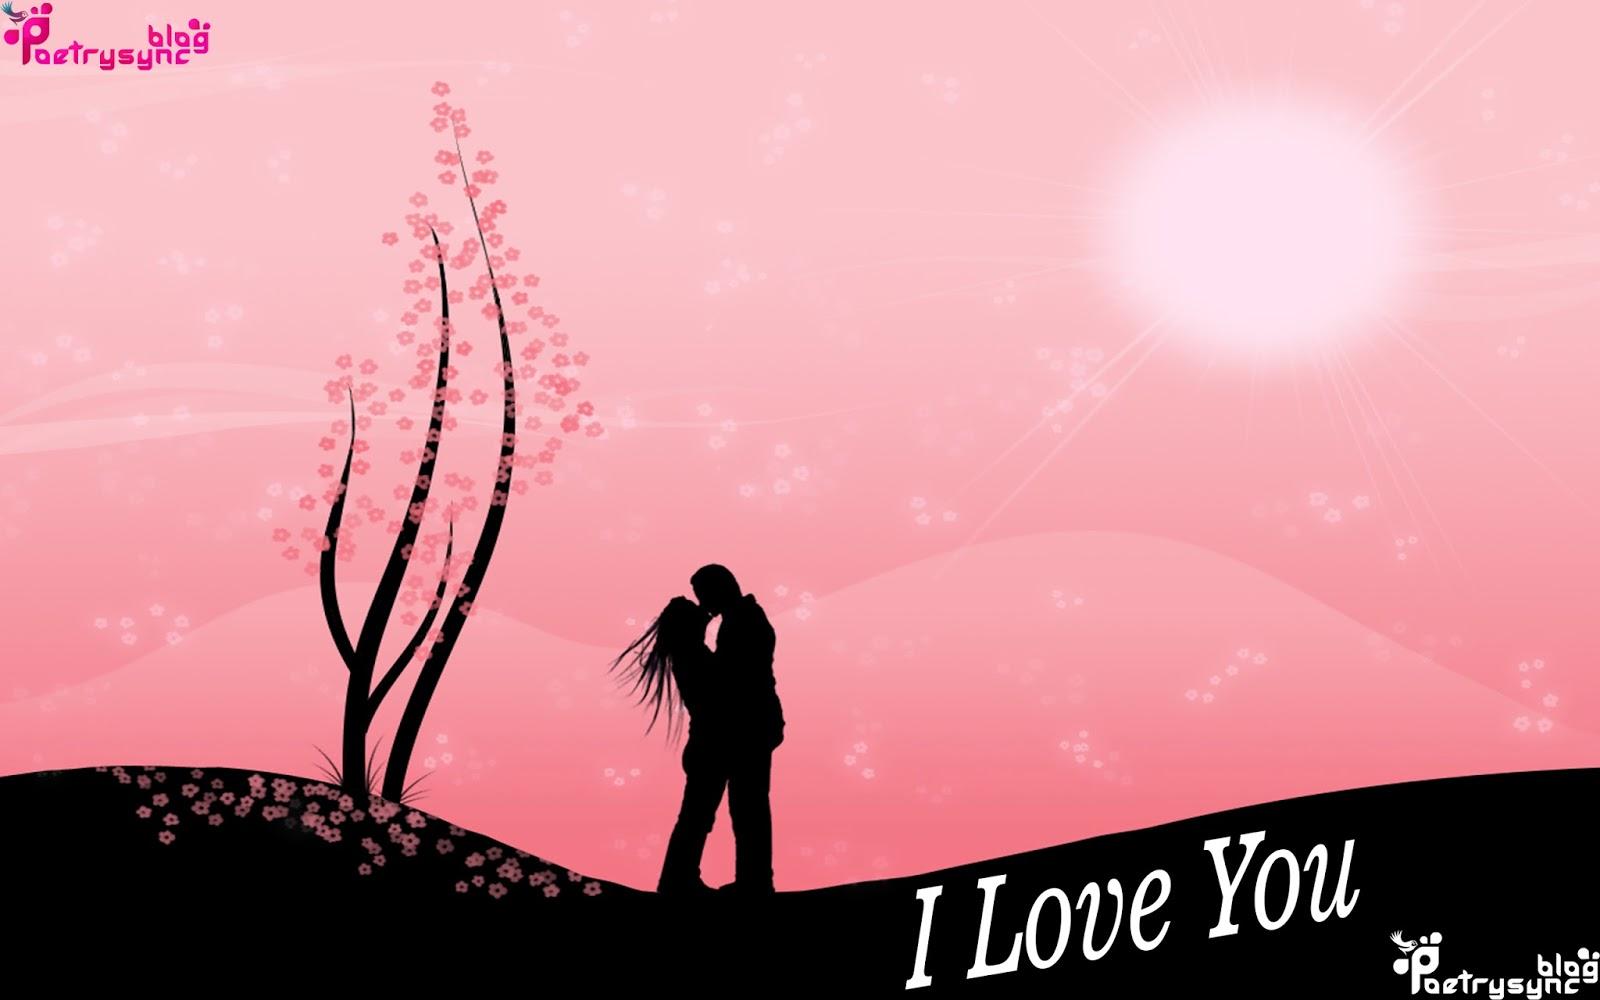 Love Girl And Boy Image Wallpaper HD